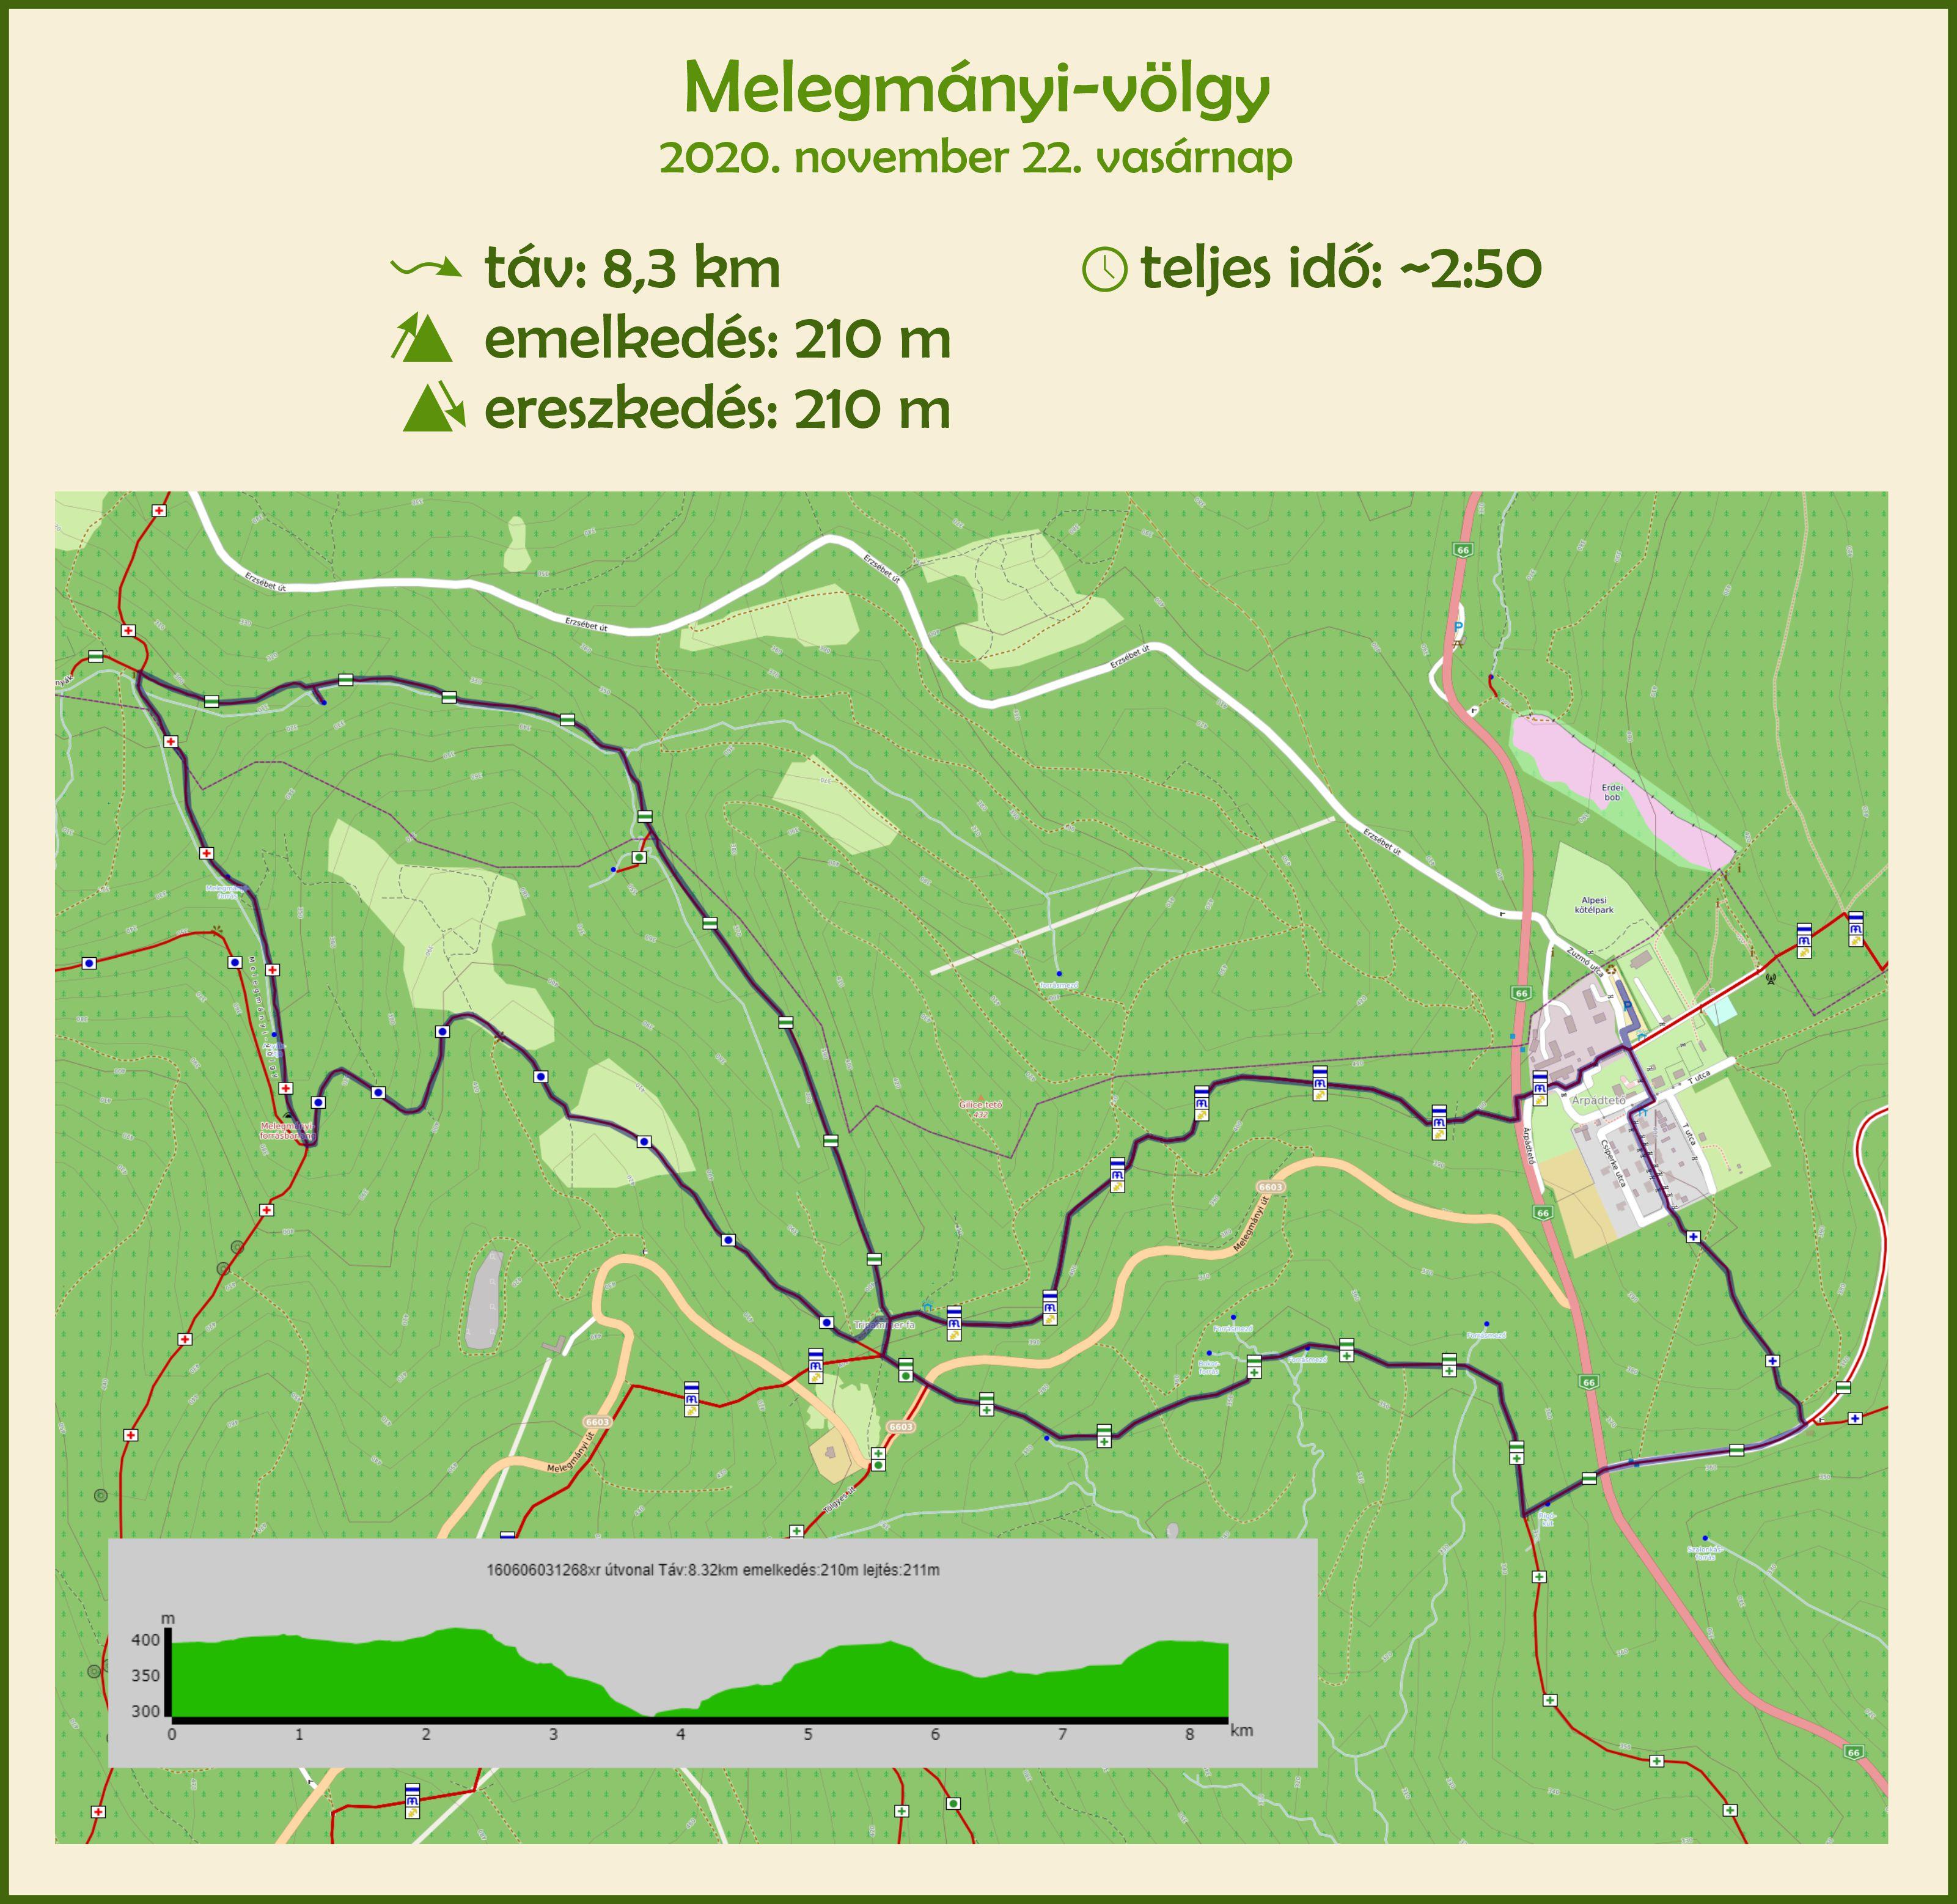 melegmanyi-volgy_20201122.jpg